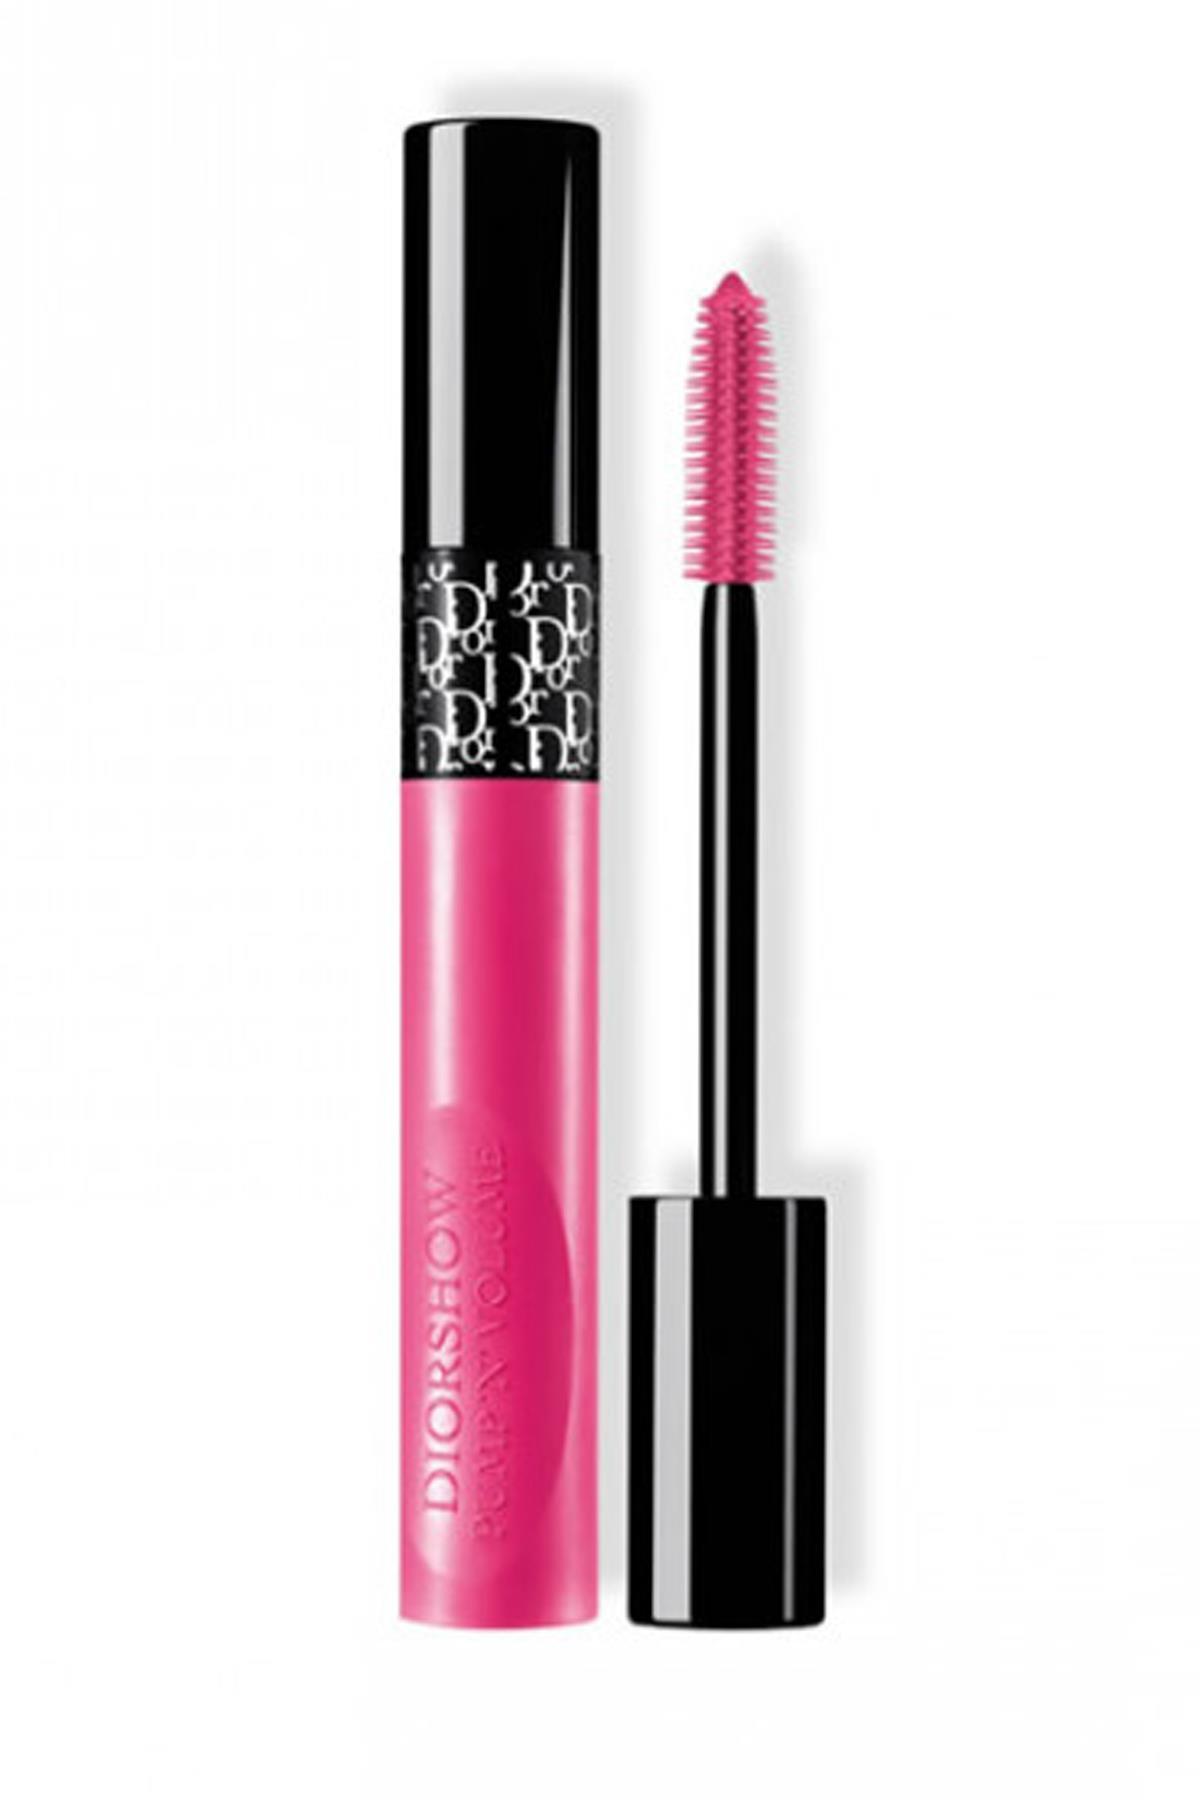 Dior Diorshow Pump'N'Volume Maskara 840 Pink Pump